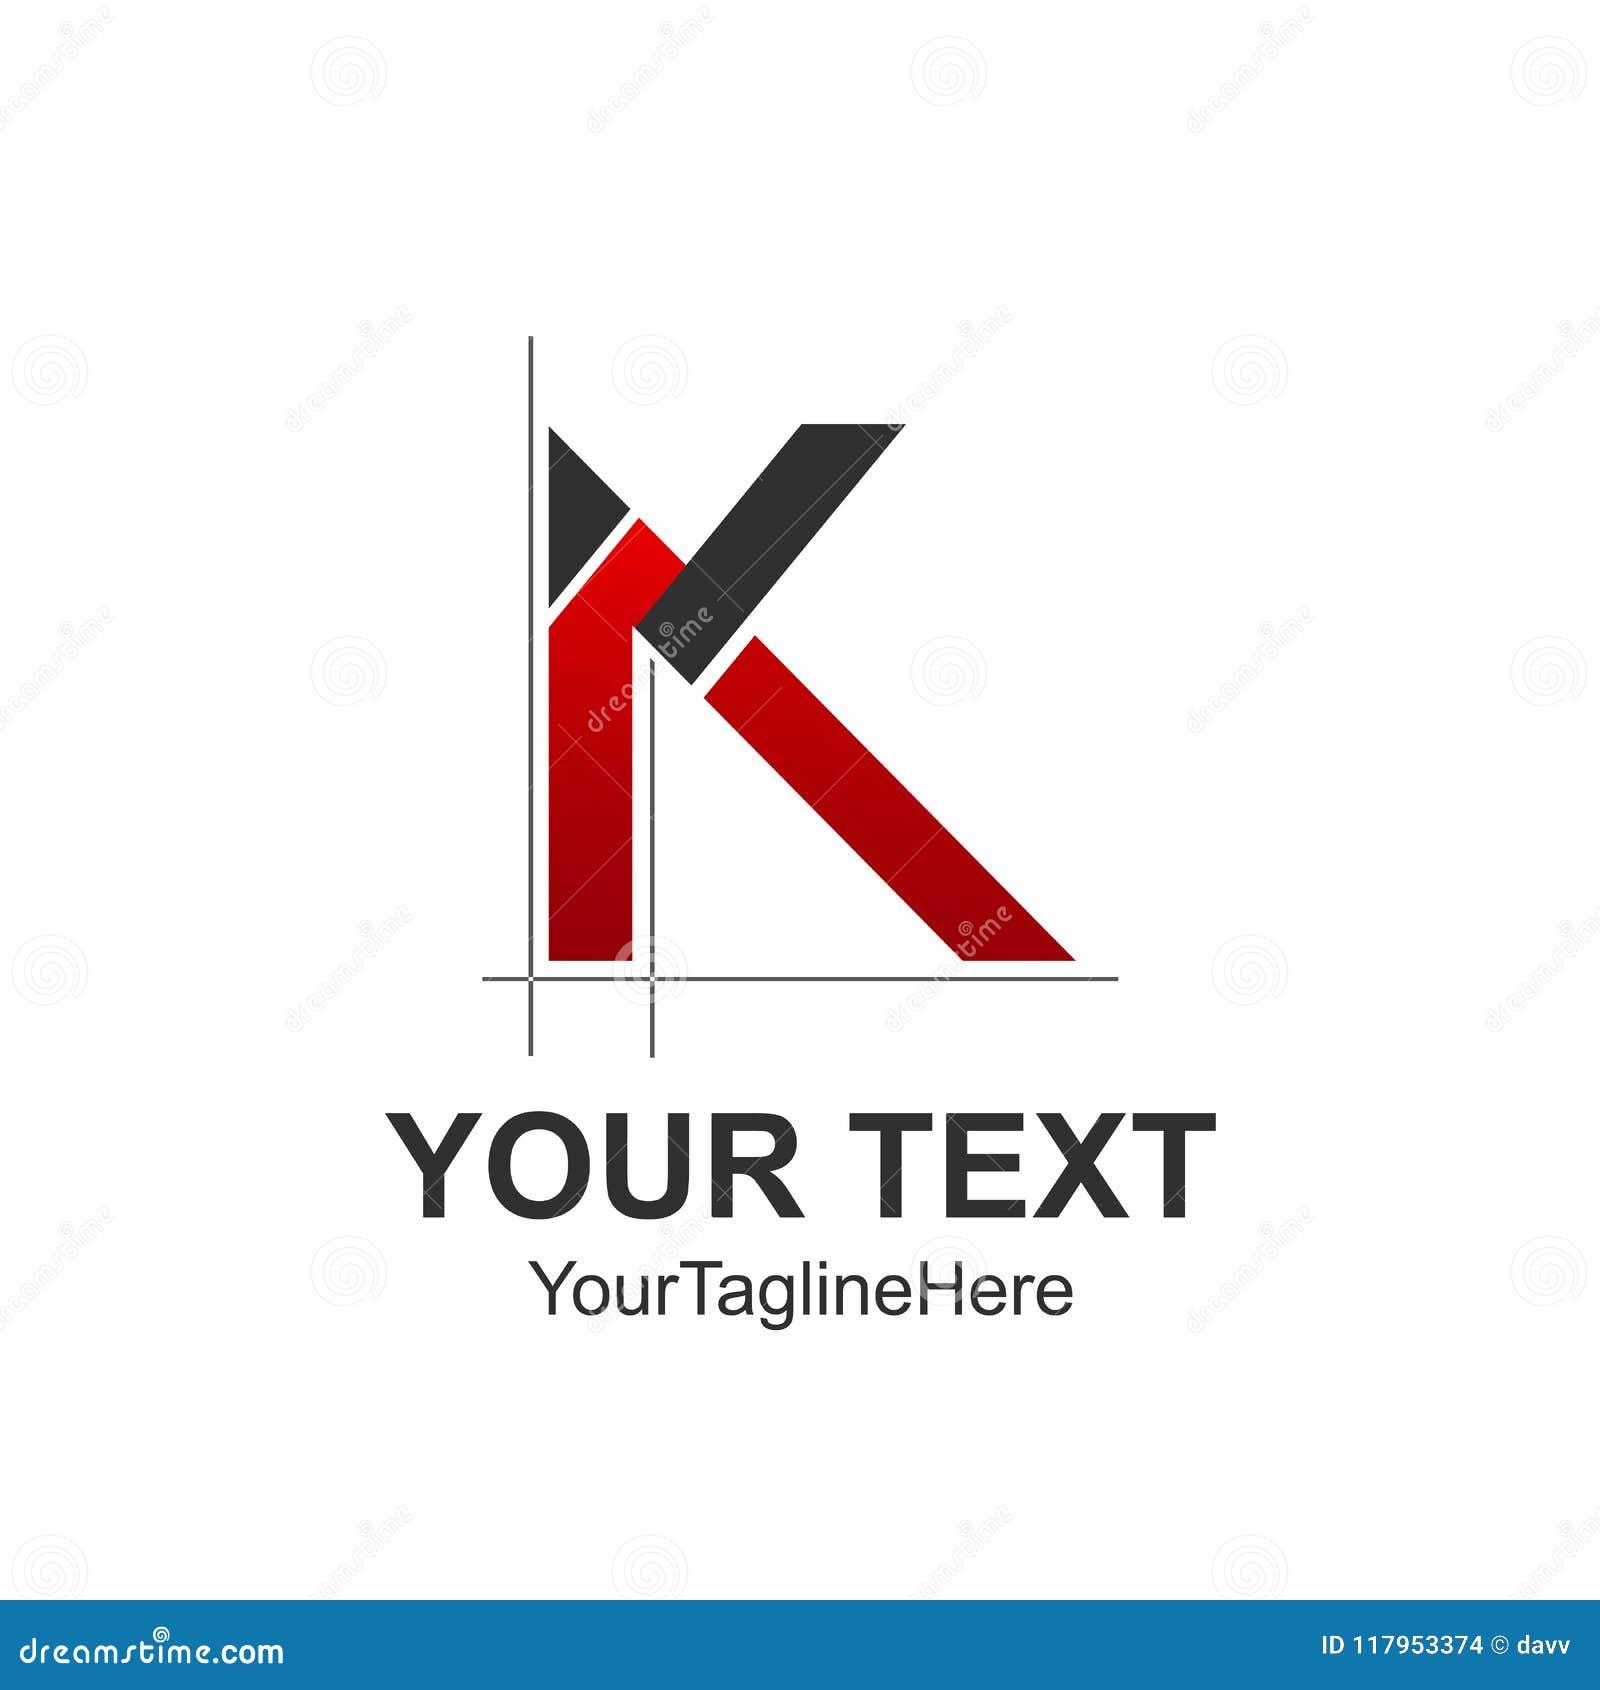 initial letter k logo design template element colored red black